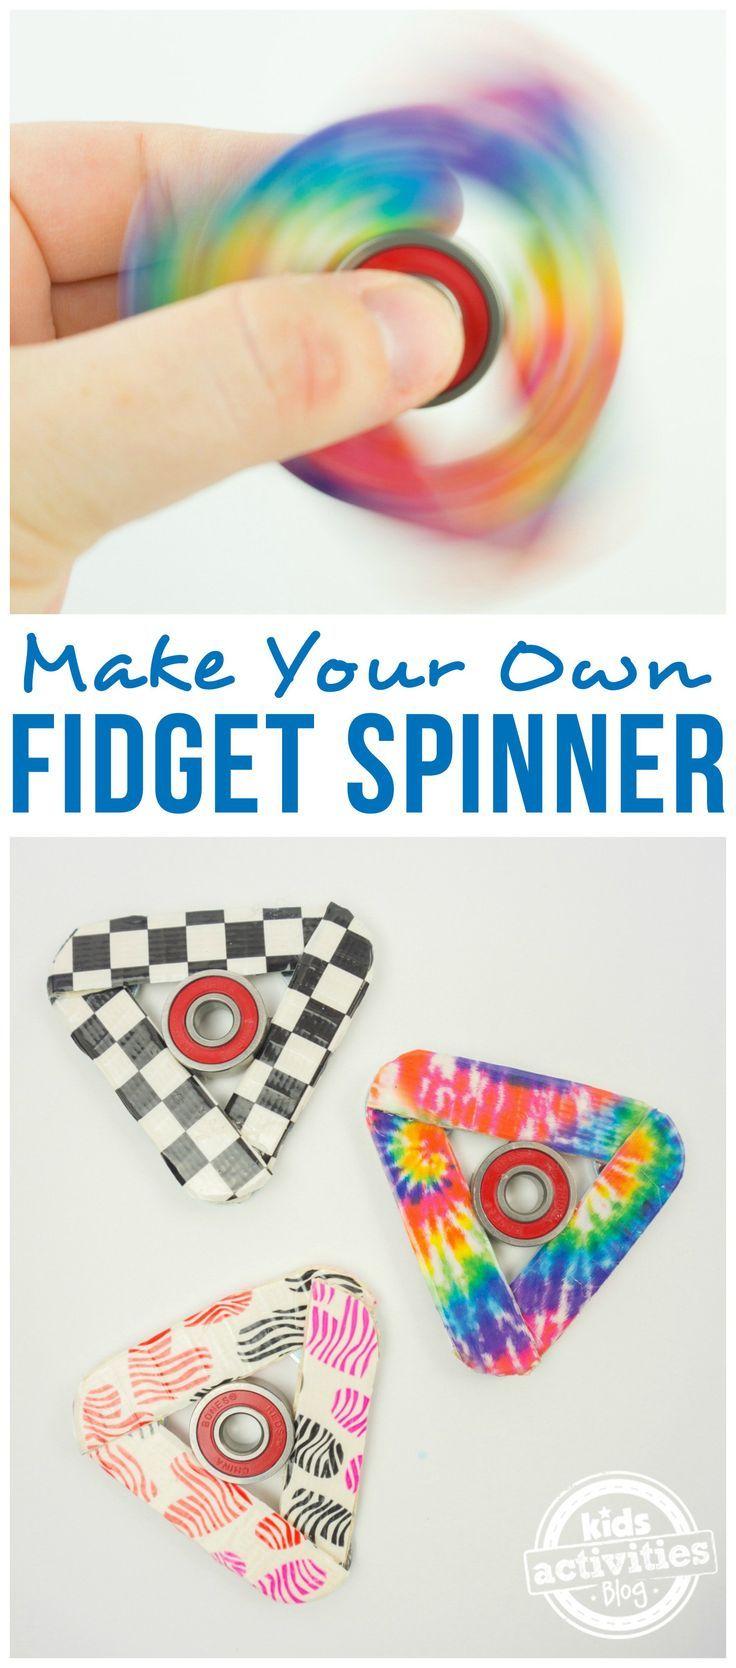 Fidget Spinner Tycoon - Roblox